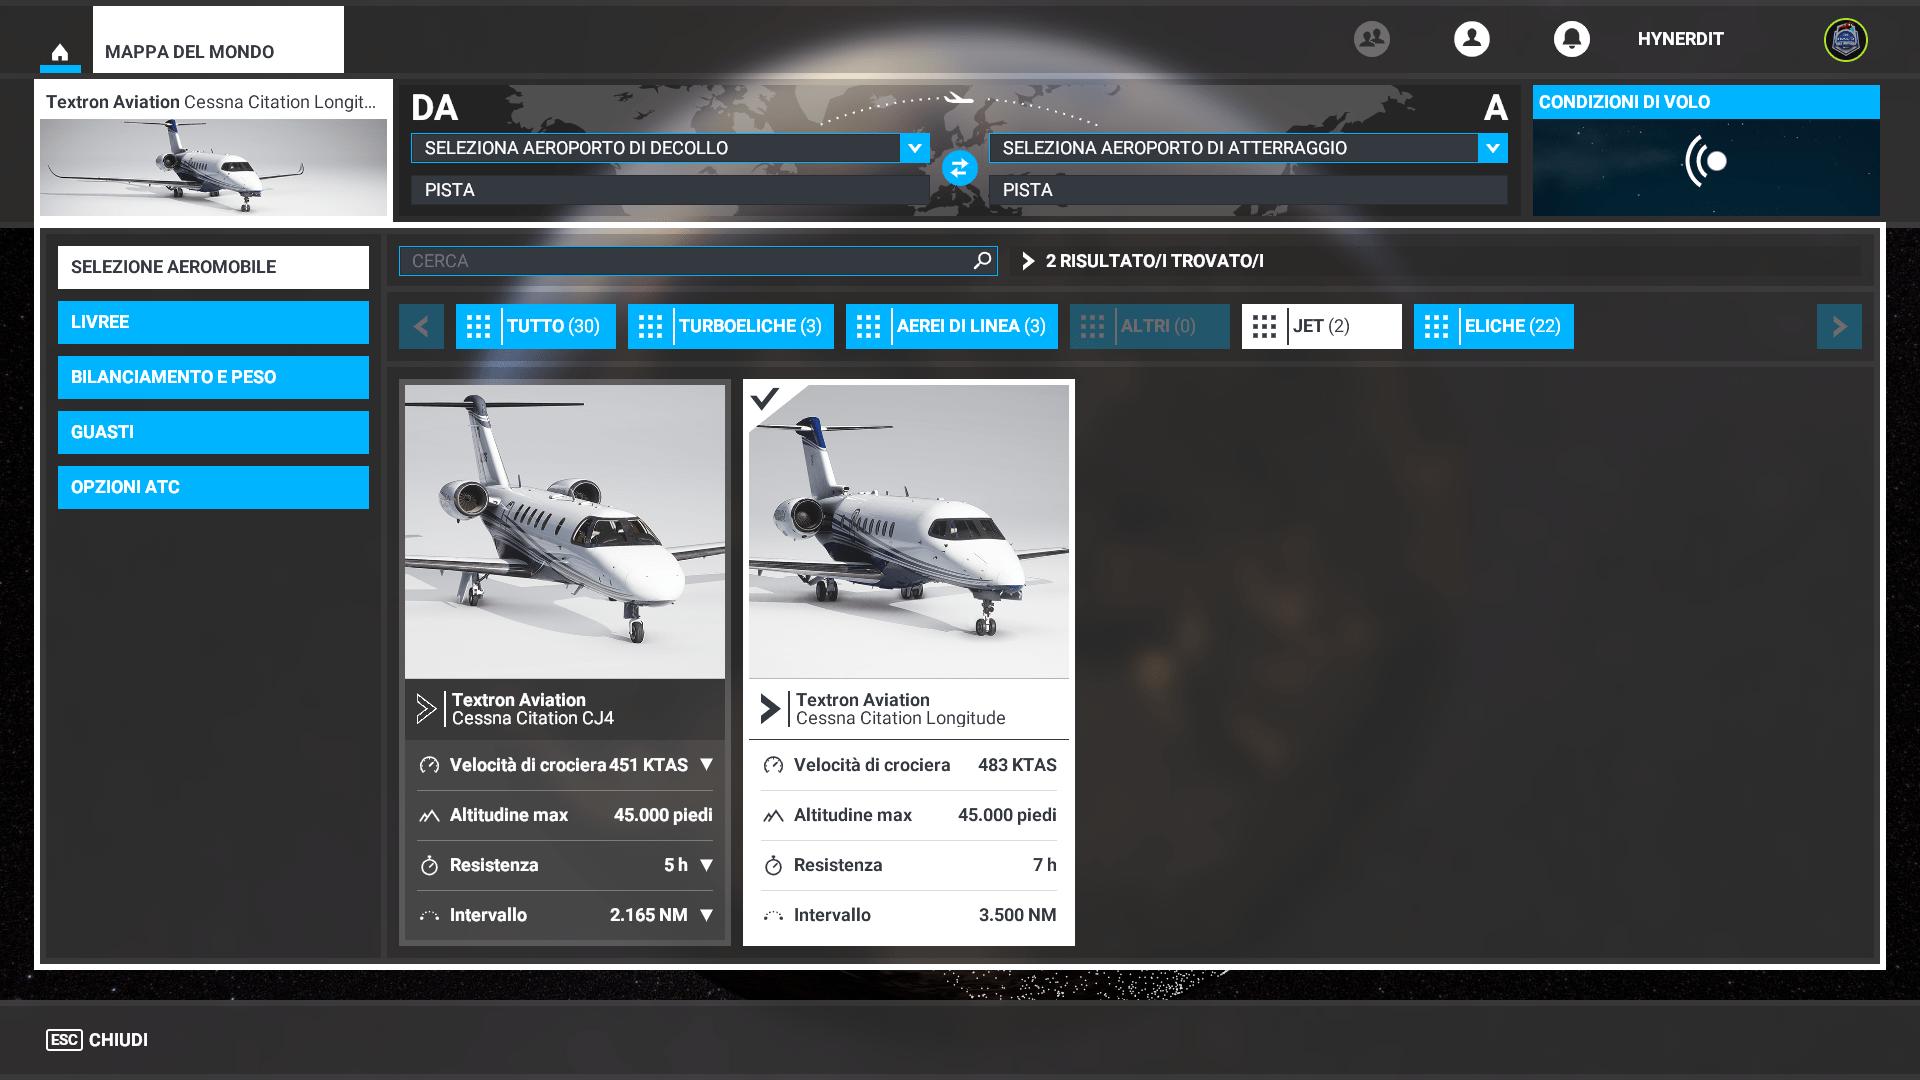 Microsoft Flight Simulator 2020: La Recensione 8 - Hynerd.it